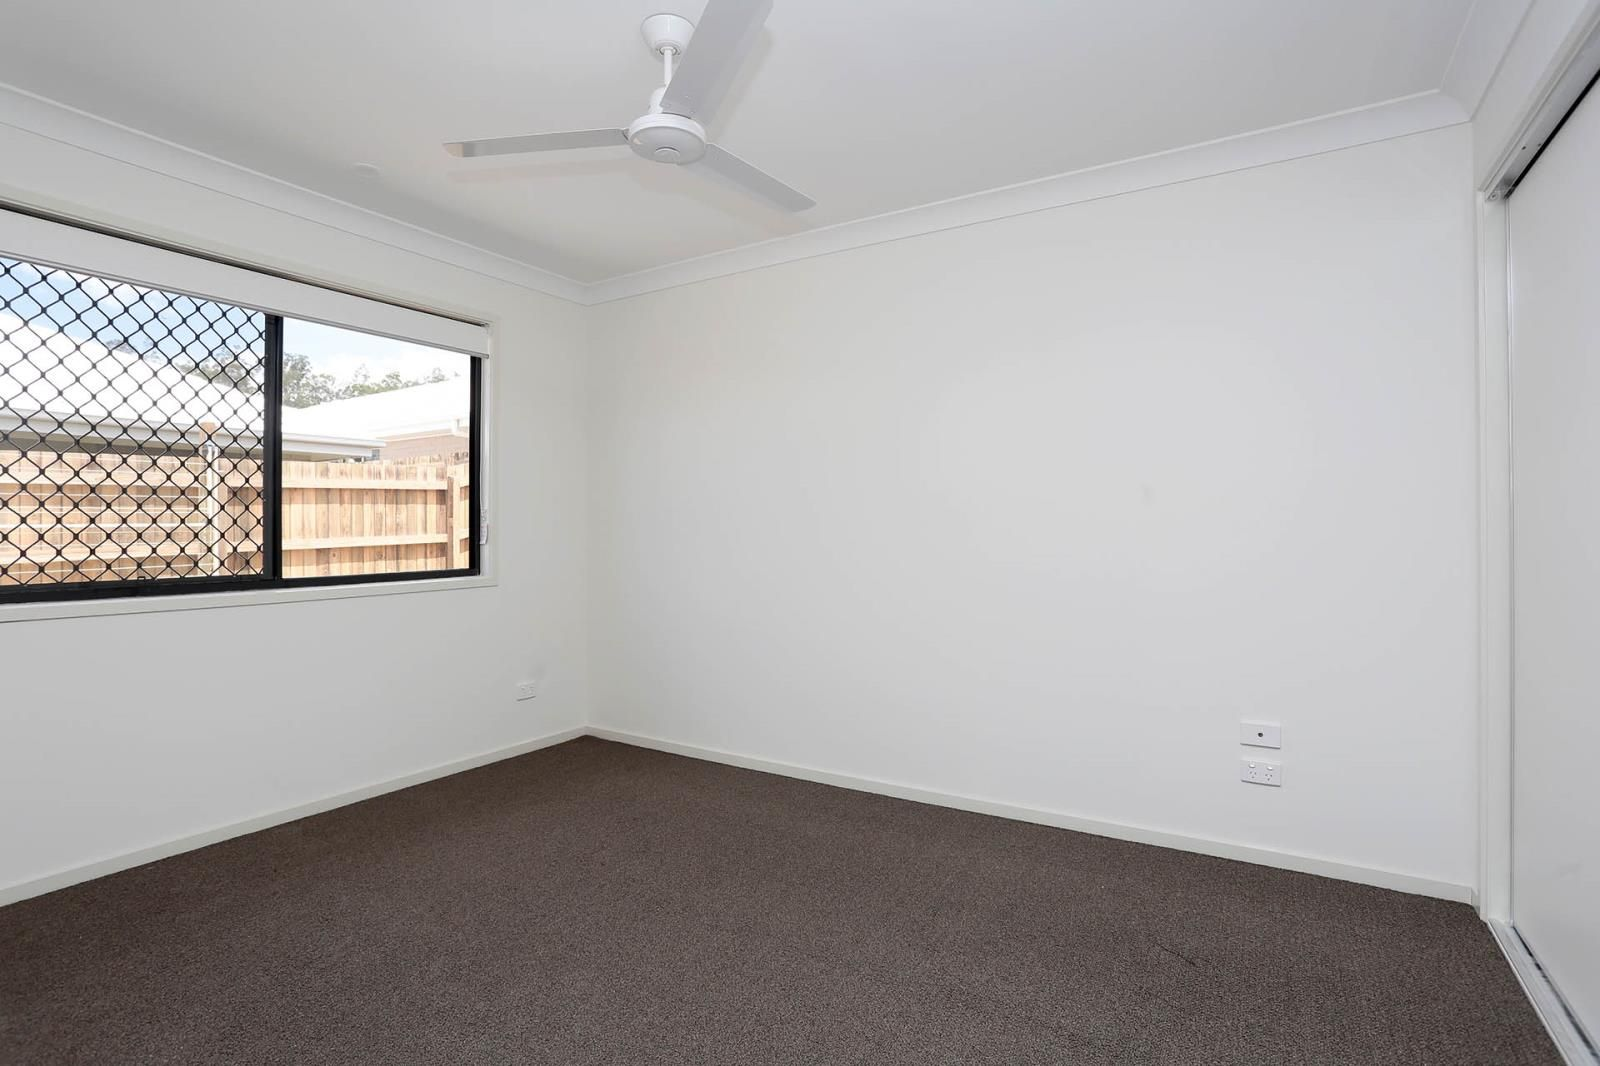 2/34 Dalby Street, Holmview QLD 4207, Image 1